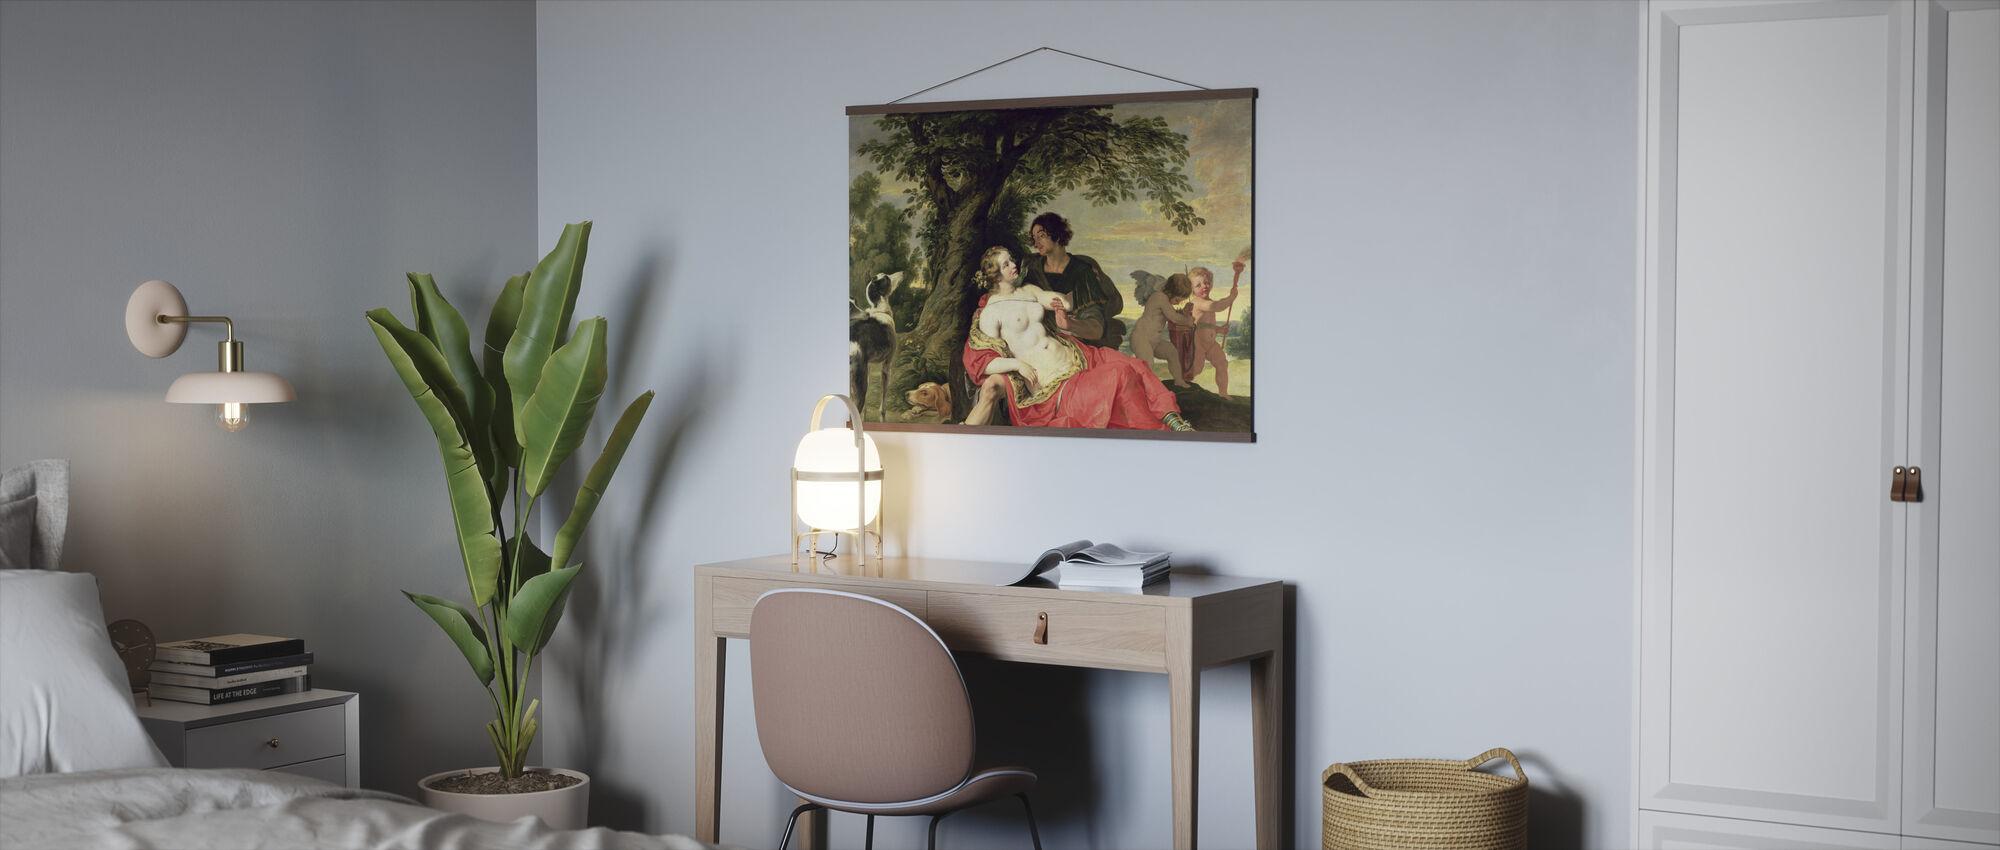 Venus and Adonis - Abraham Janssens - Poster - Office